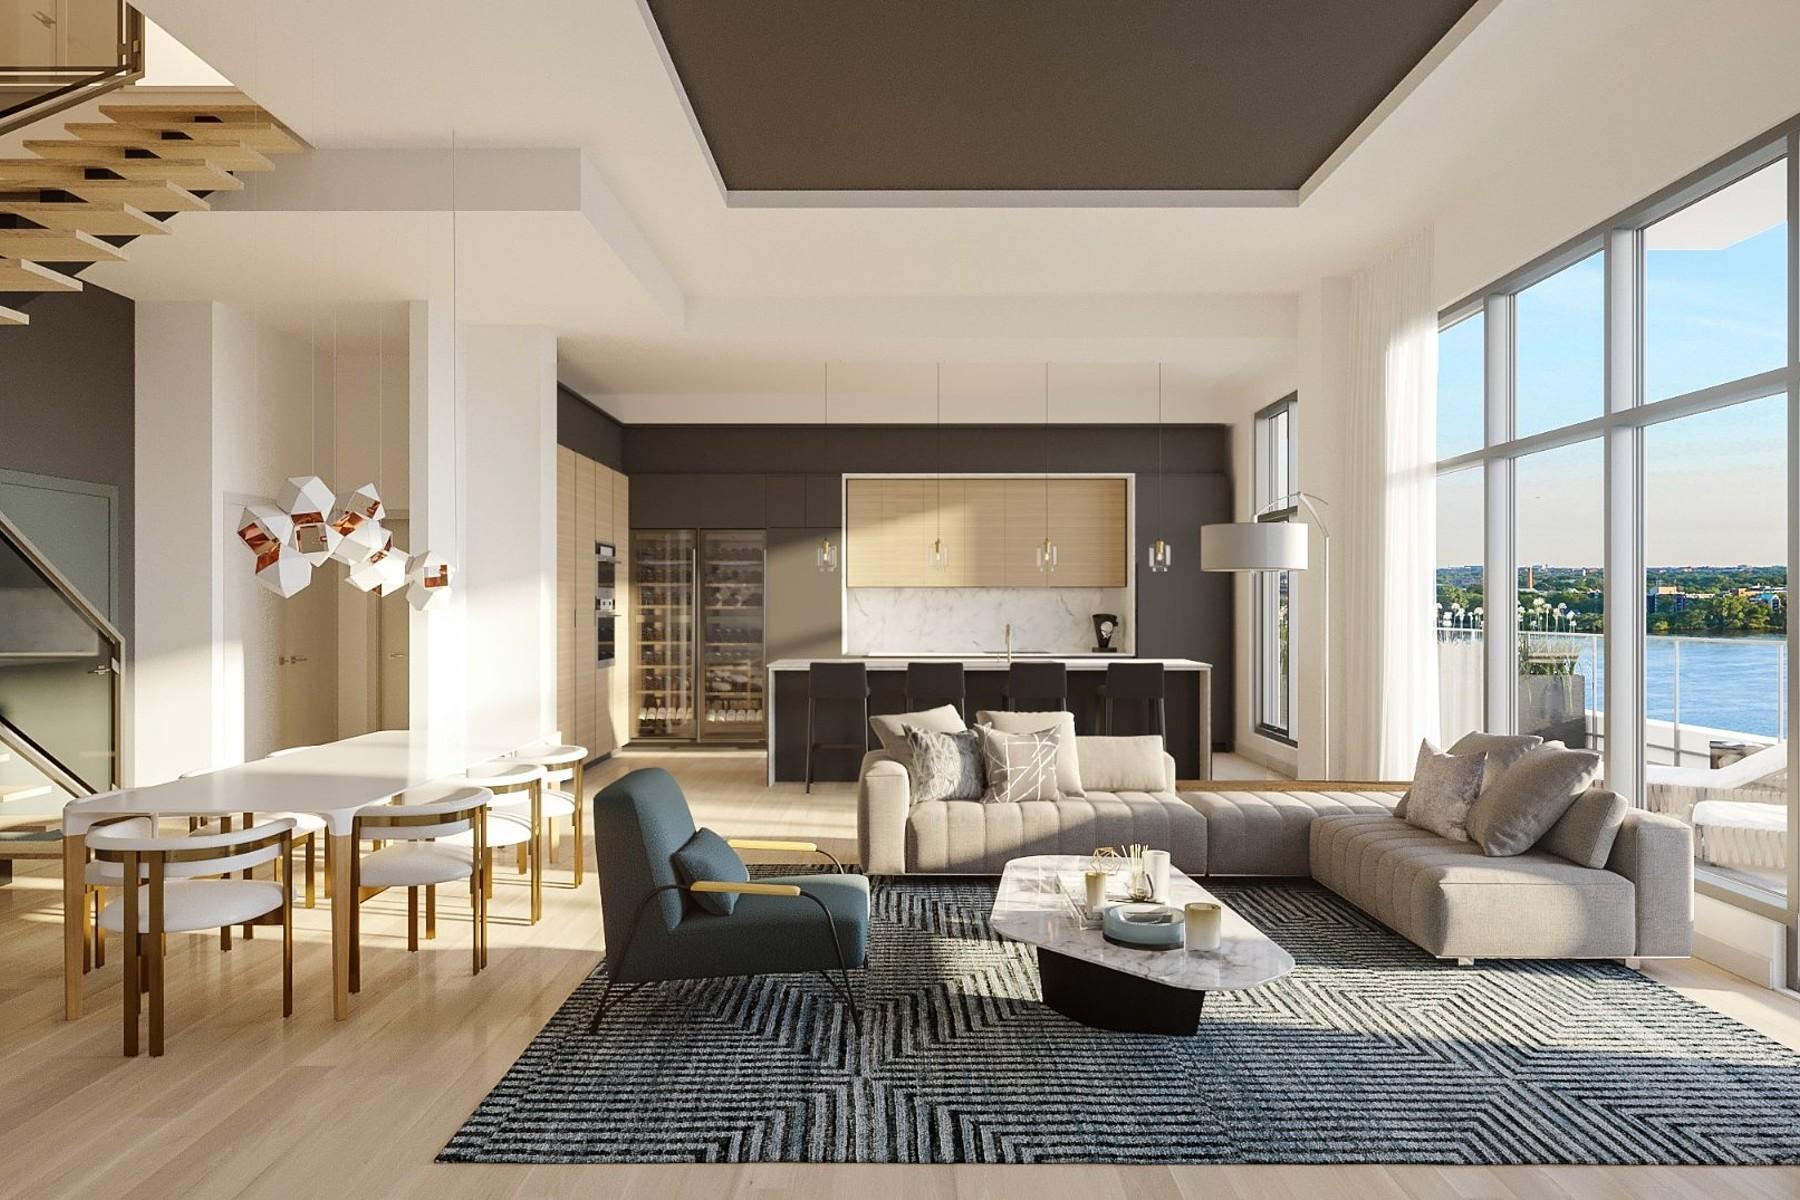 Condominiums for Sale at Pont-Viau, Laval 9 Boul. des Prairies, Apt. PH5 Pont-Viau, Quebec H7B2E6 Canada